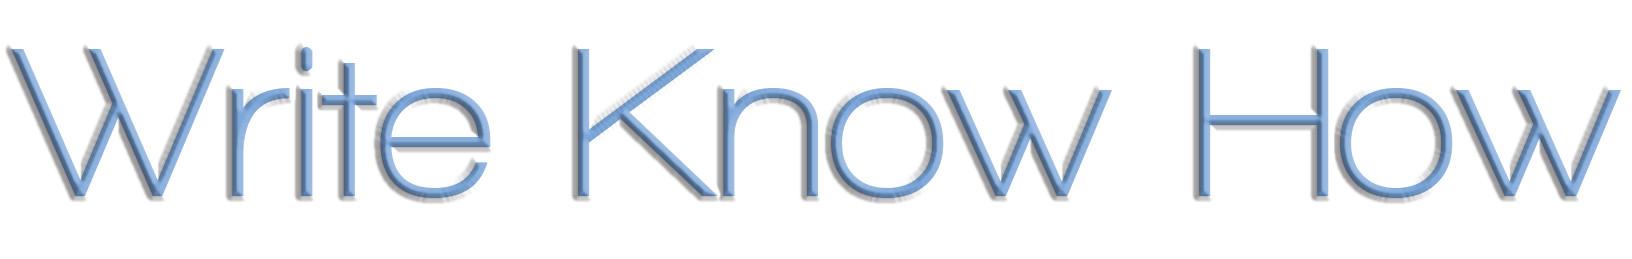 writeknowhow